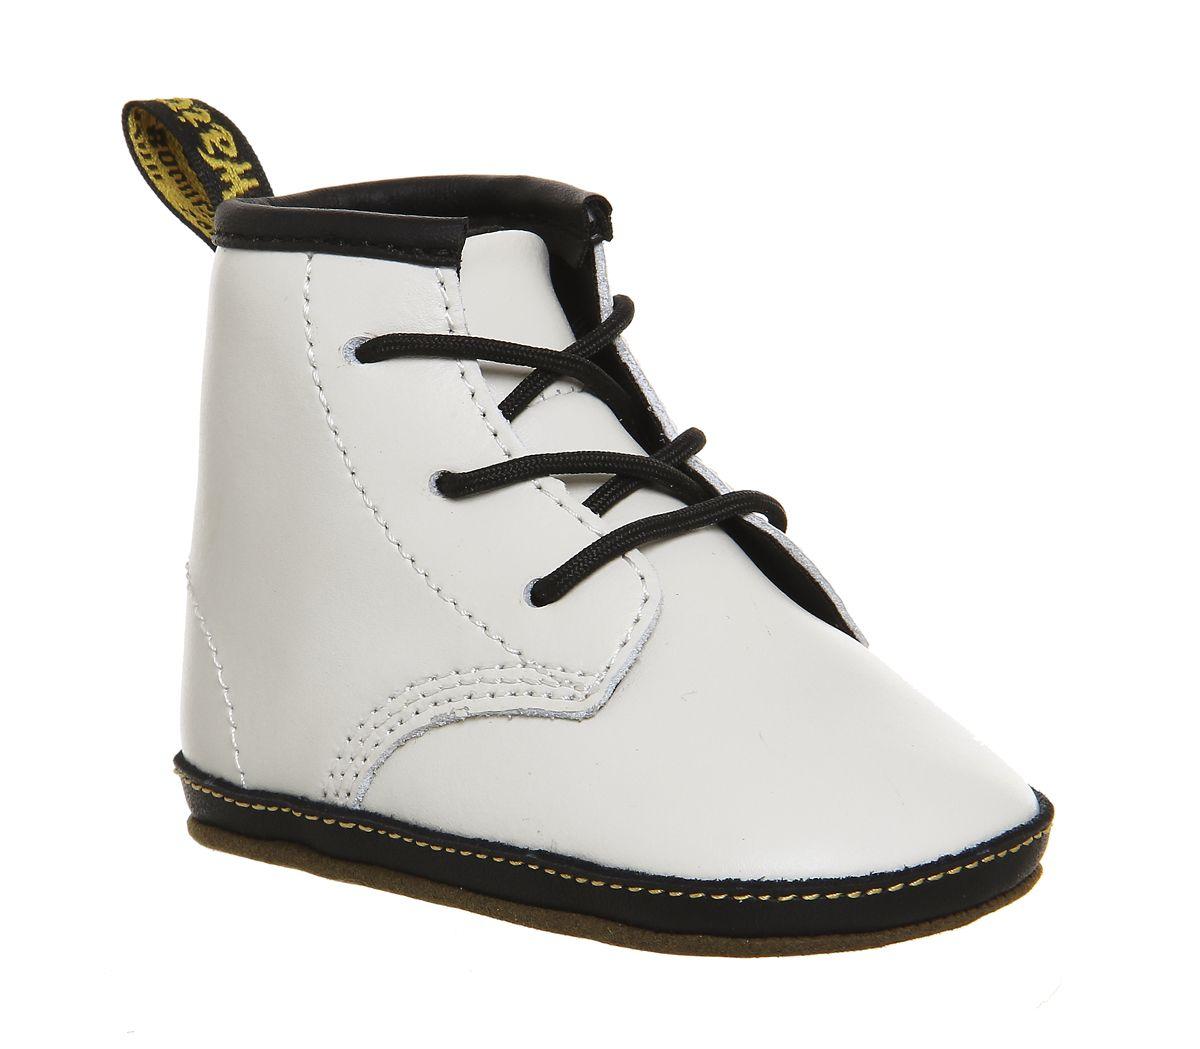 d4b58cf8f Dr. Martens Crib Bootie Auburn White Leather - Unisex